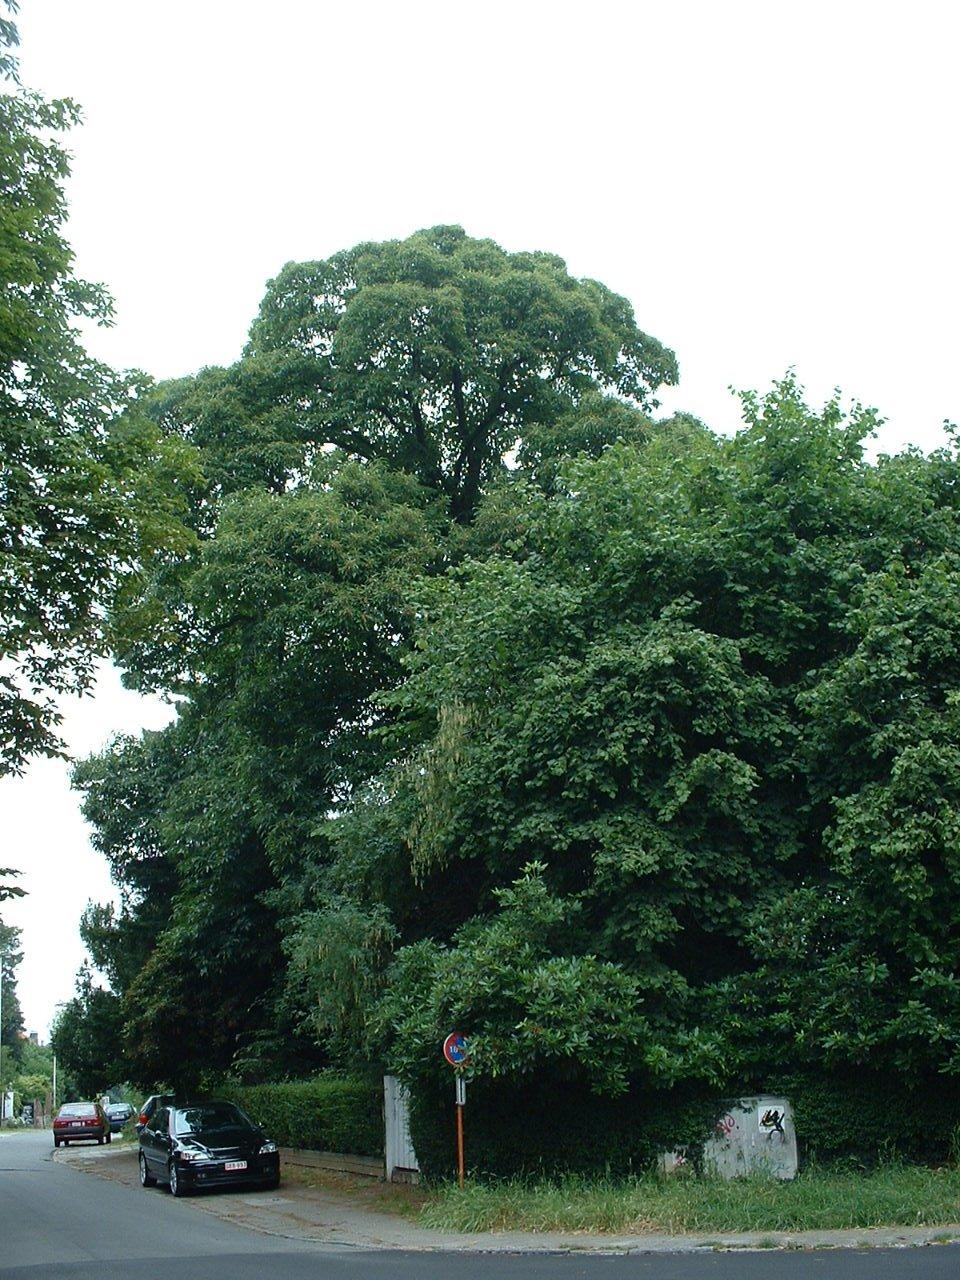 Châtaignier – Watermael-Boitsfort, Avenue Emile Van Becelaere, 29 –  25 Juillet 2002